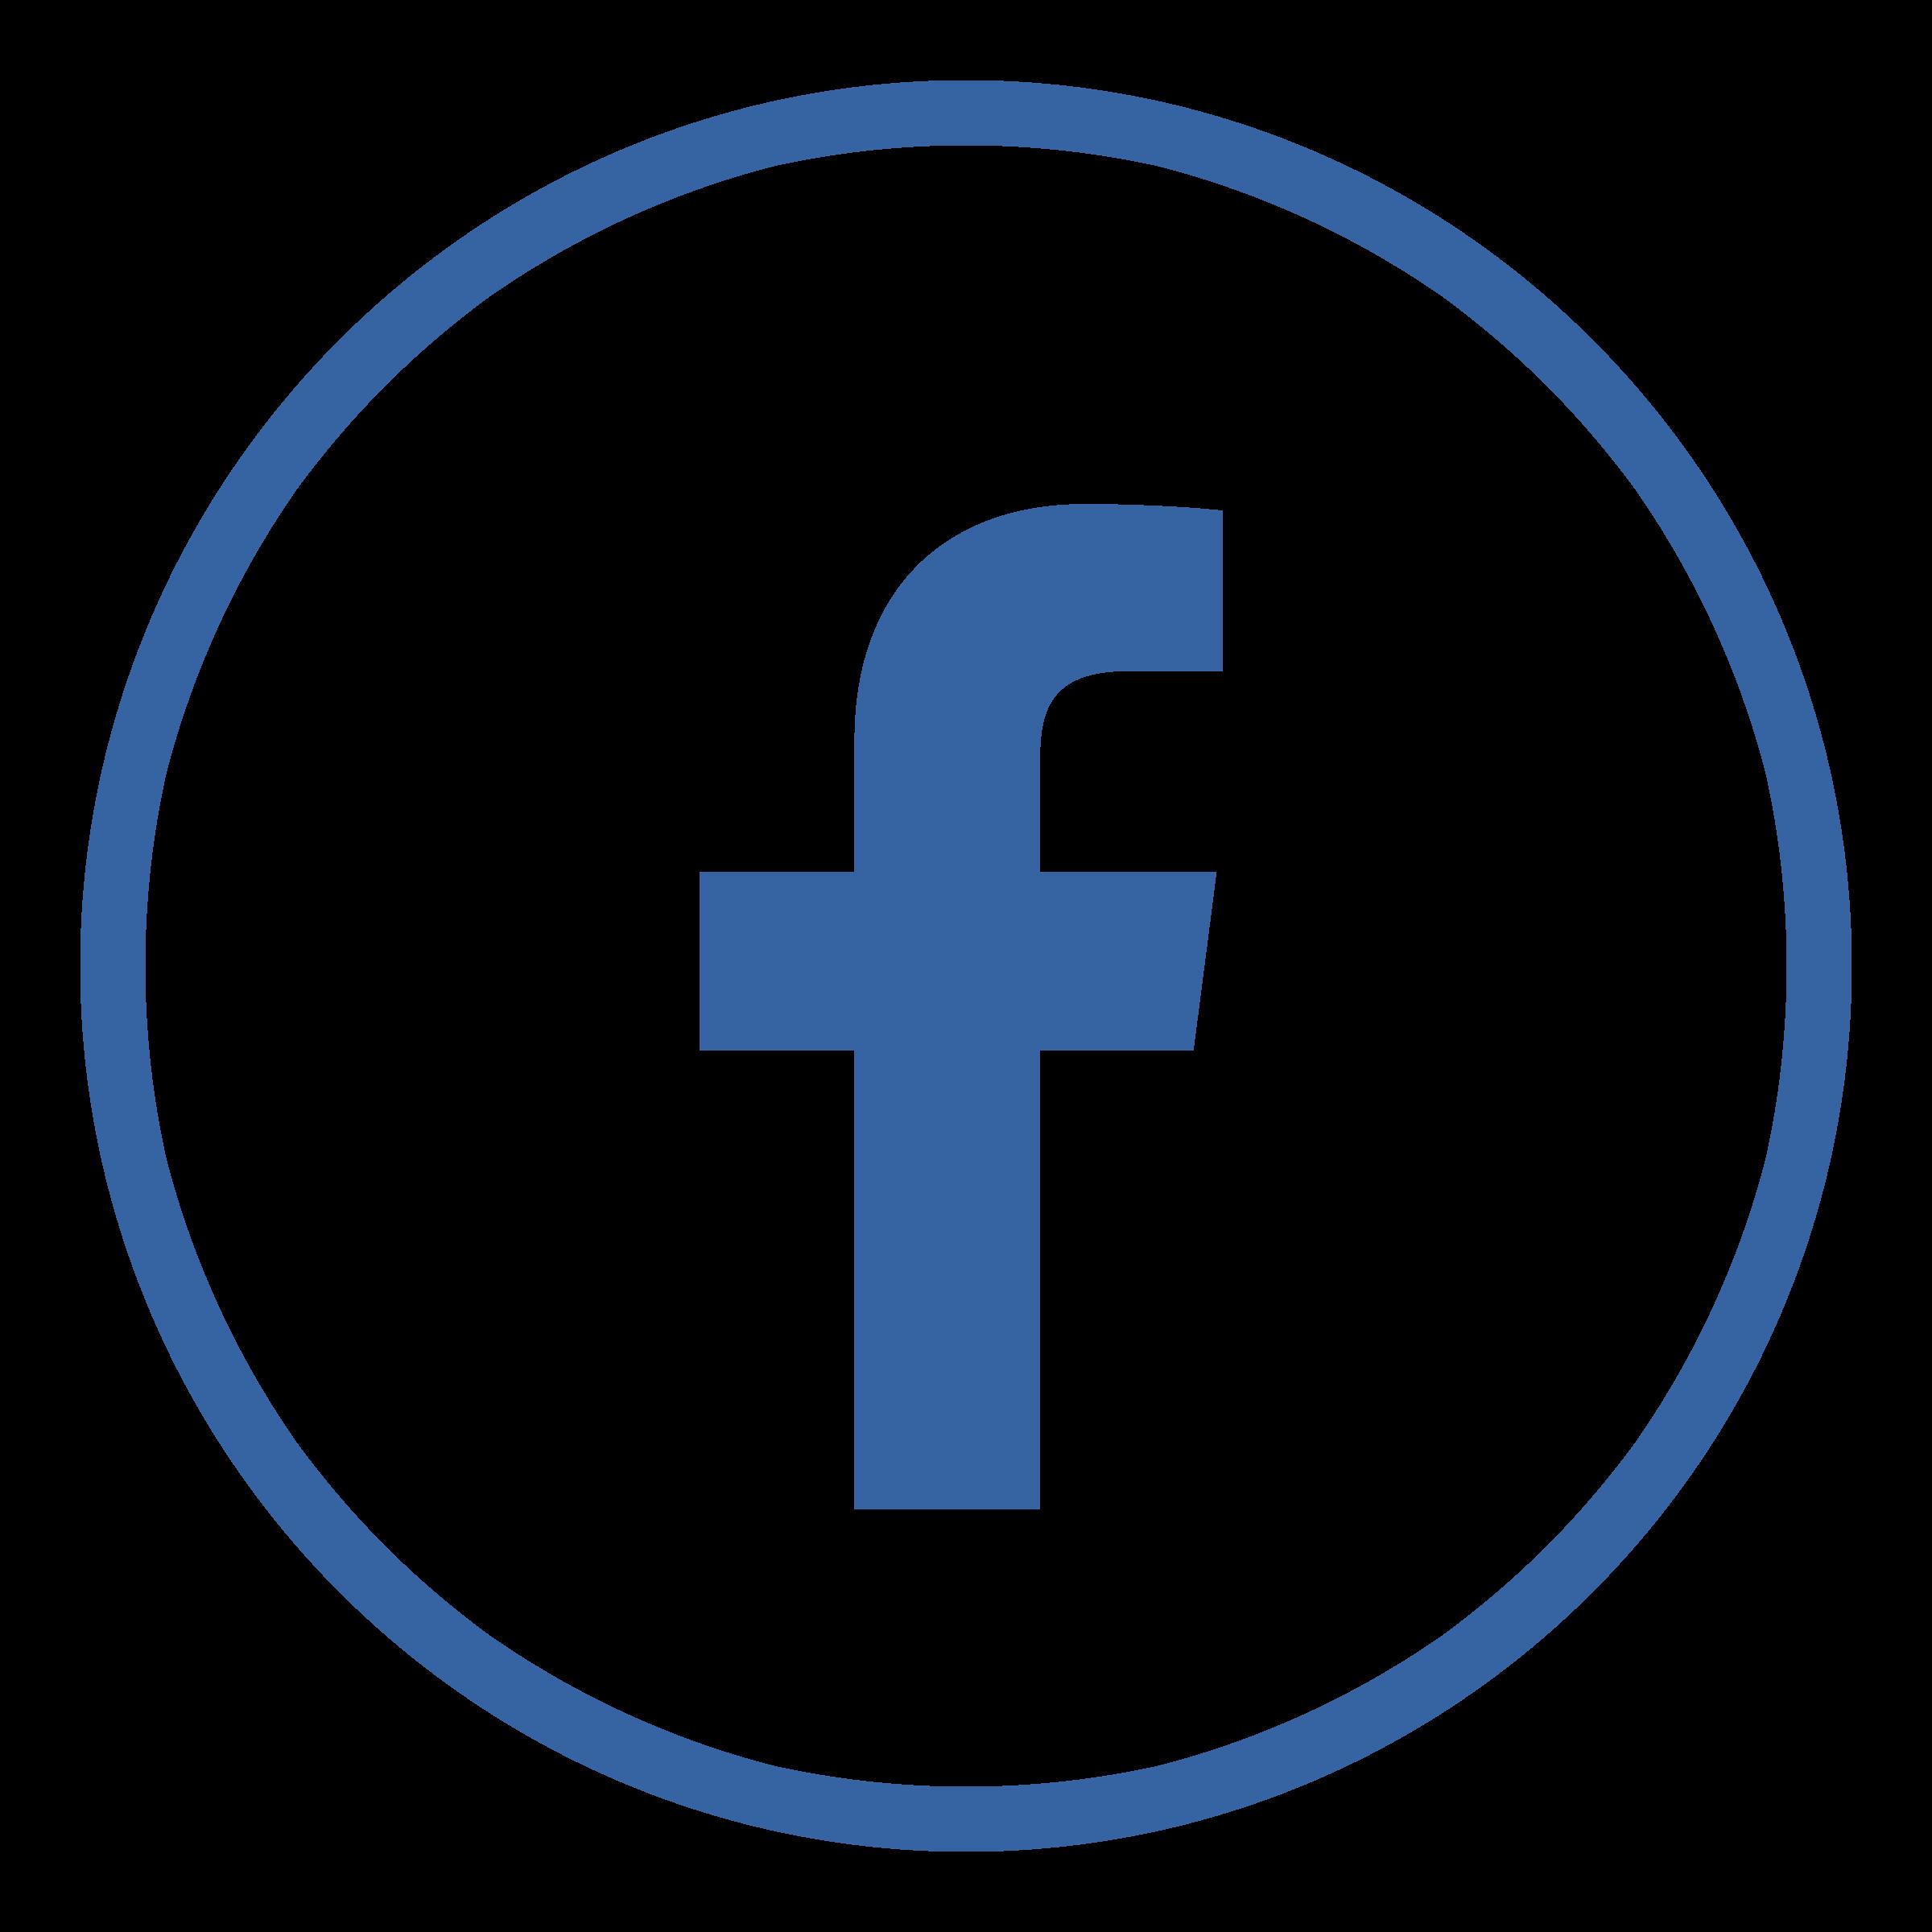 2400x2400 Facebook Logo Png Transparent Amp Svg Vector